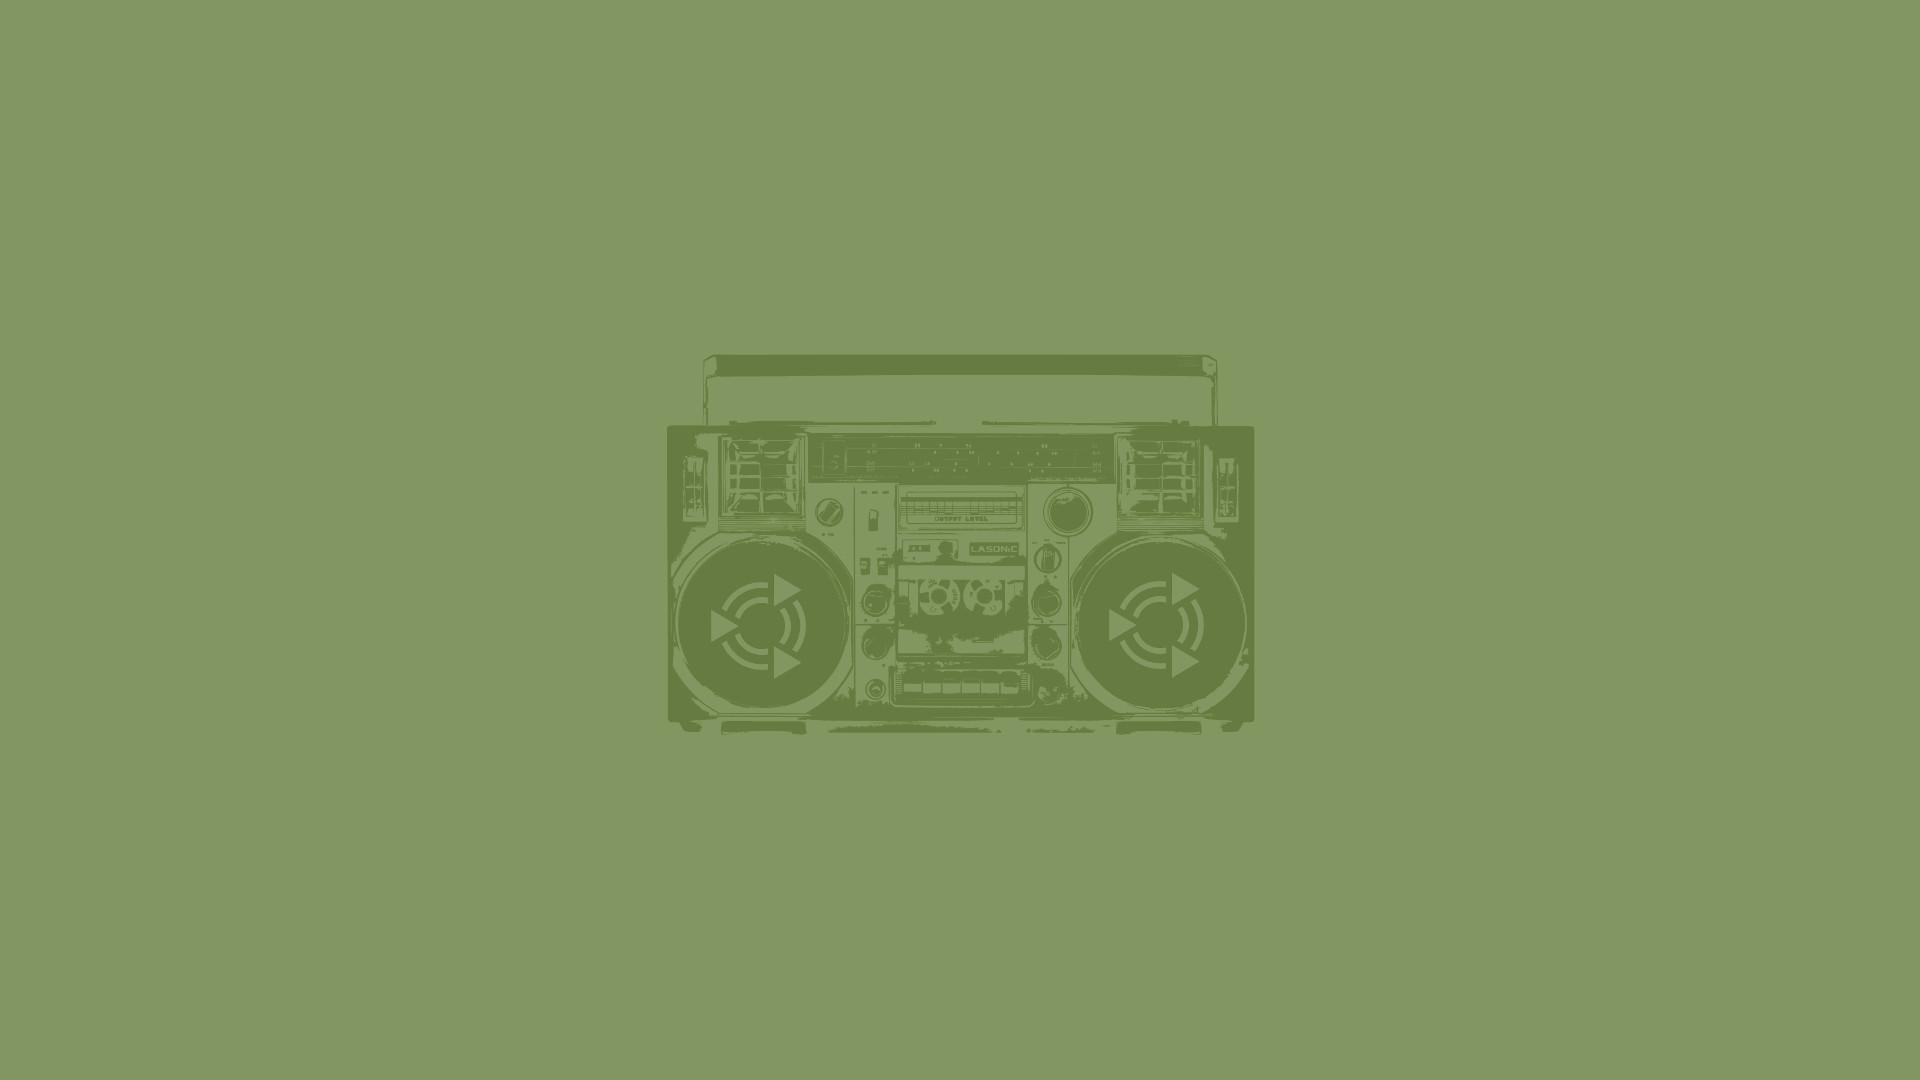 Res: 1920x1080, Boom Light Green.jpg 56.9 KB